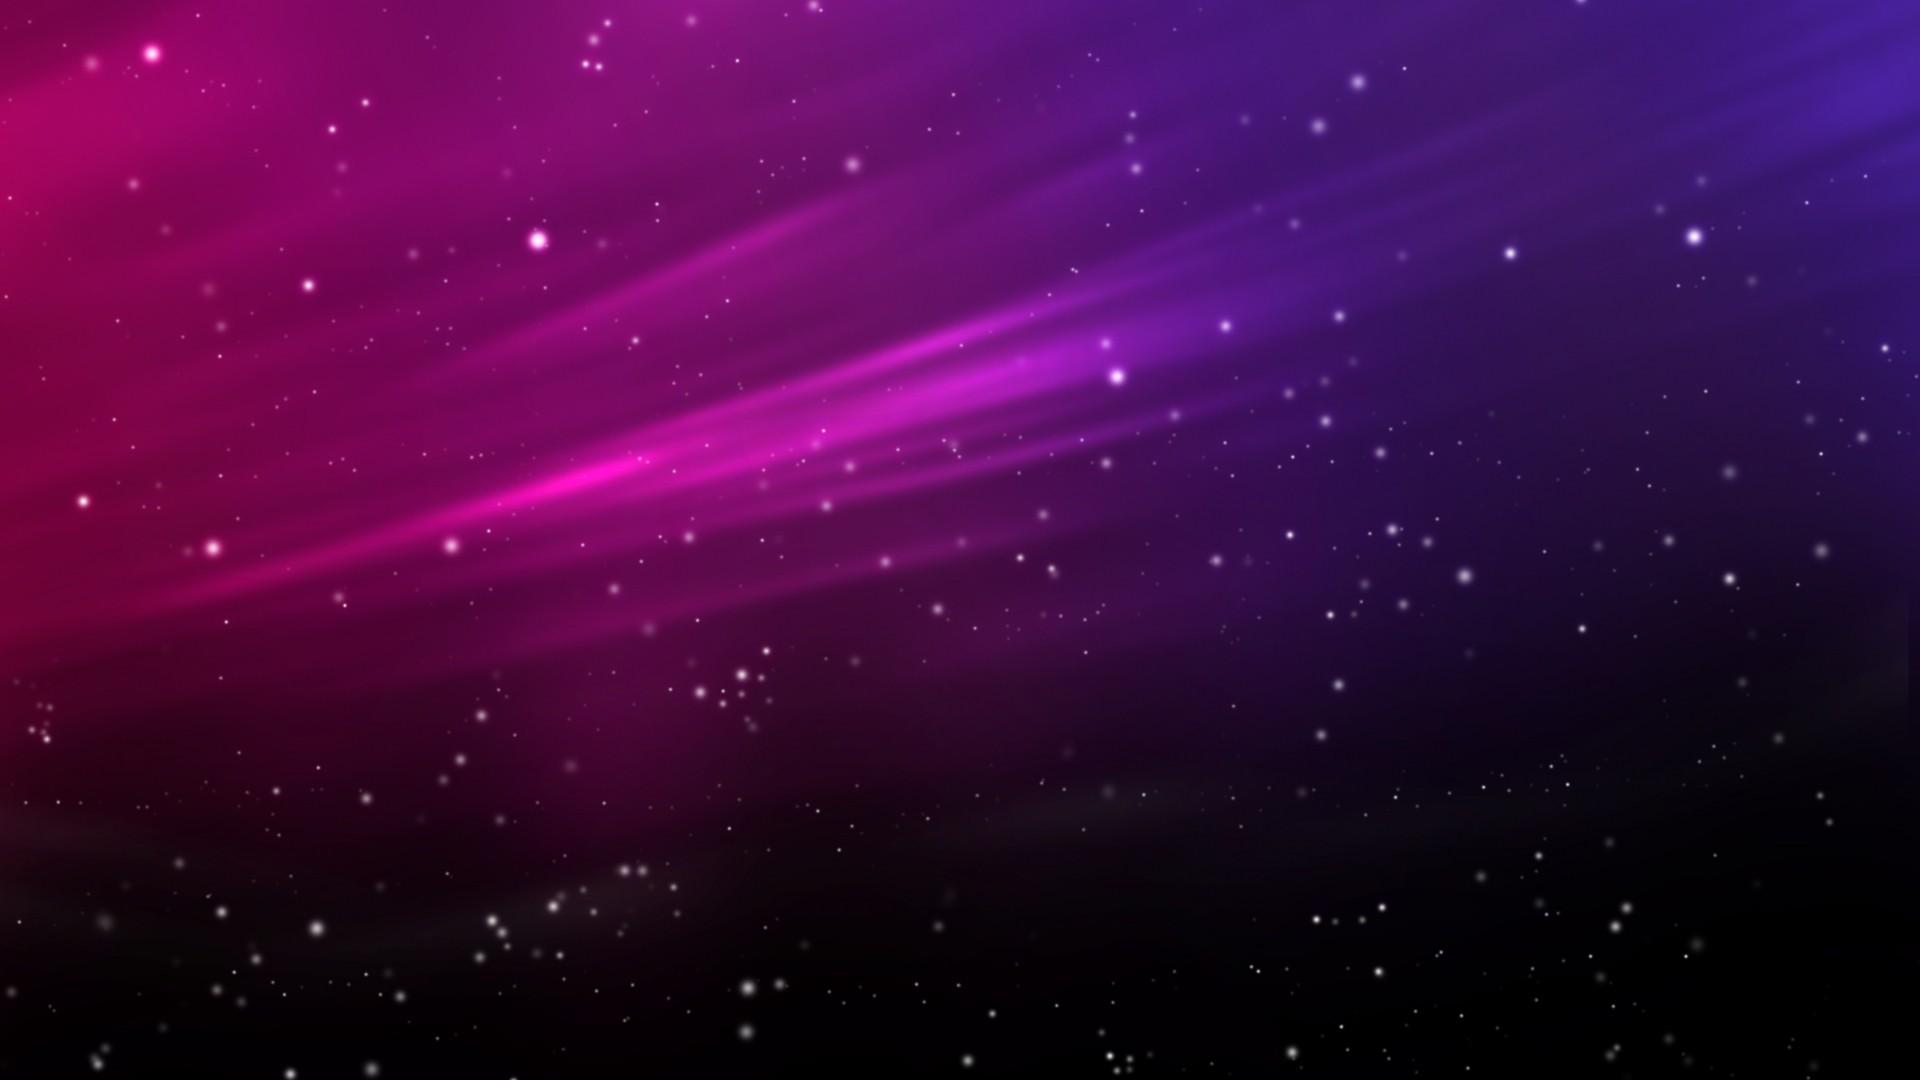 Pink And Purple Desktop Wallpaper